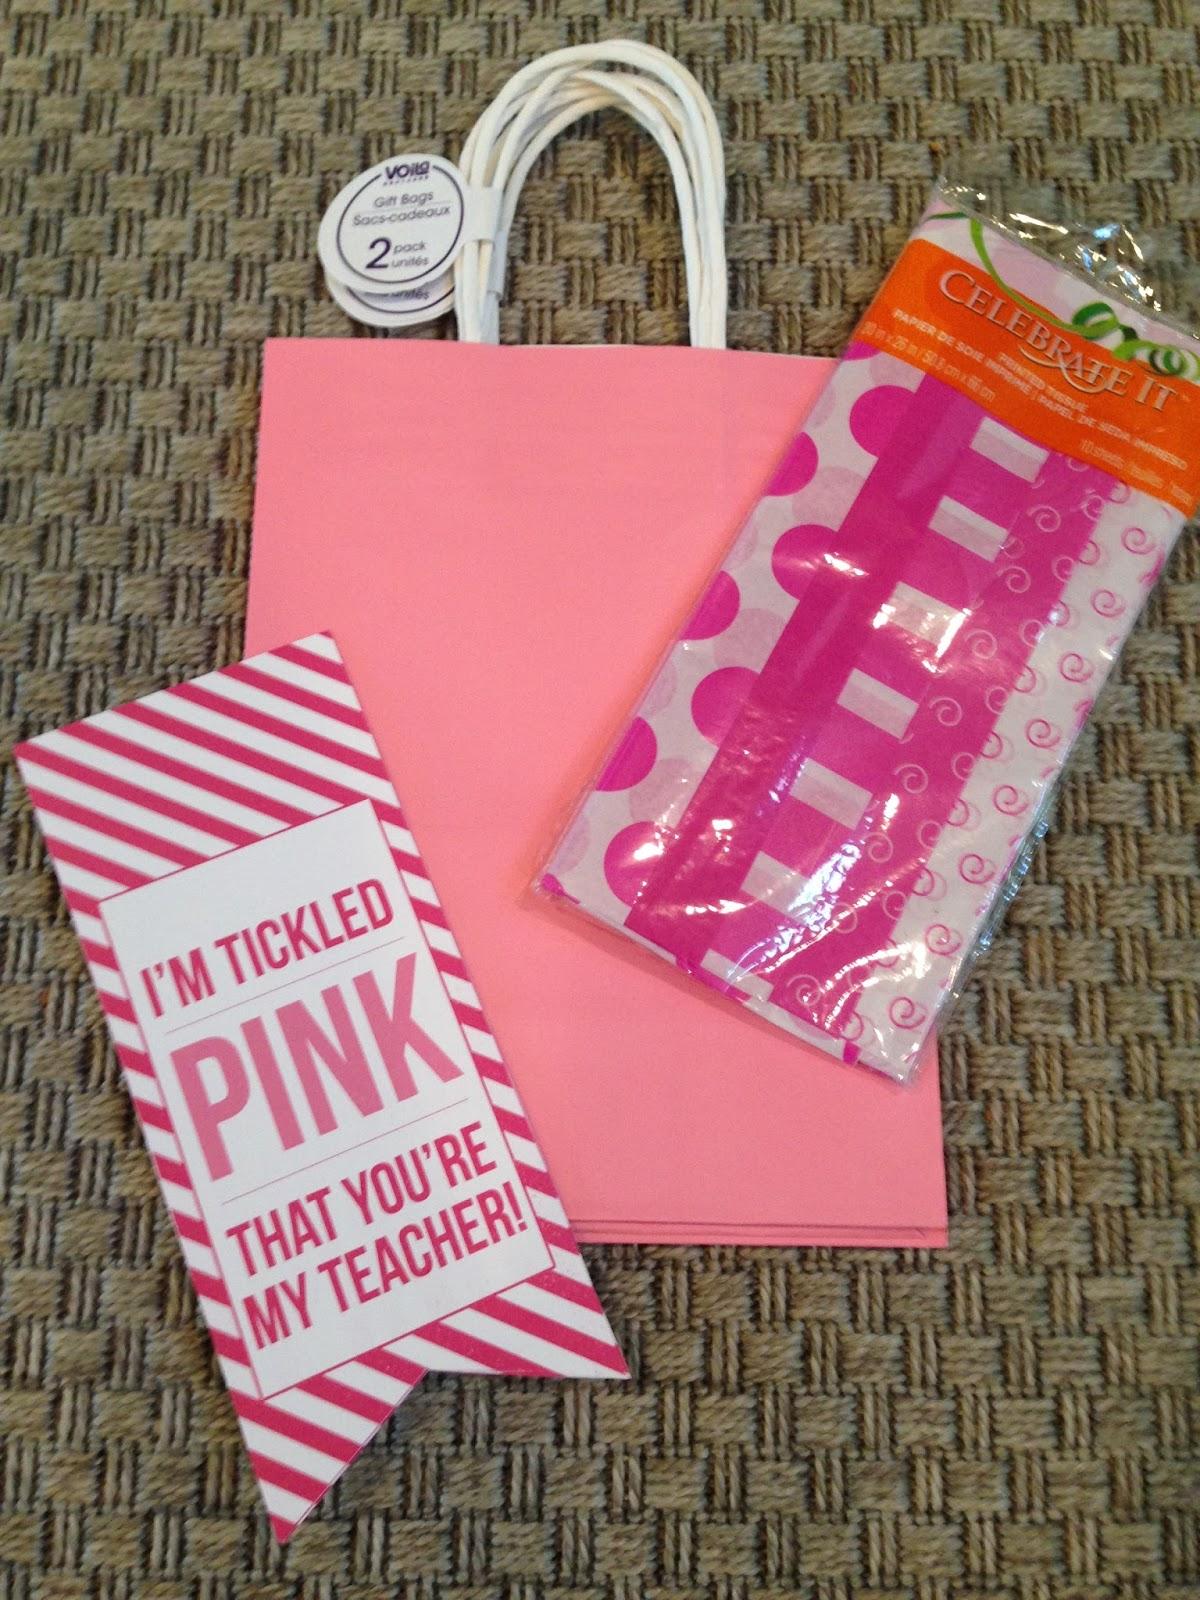 Teacher T I M Tickled Pink That You Re My Teacher